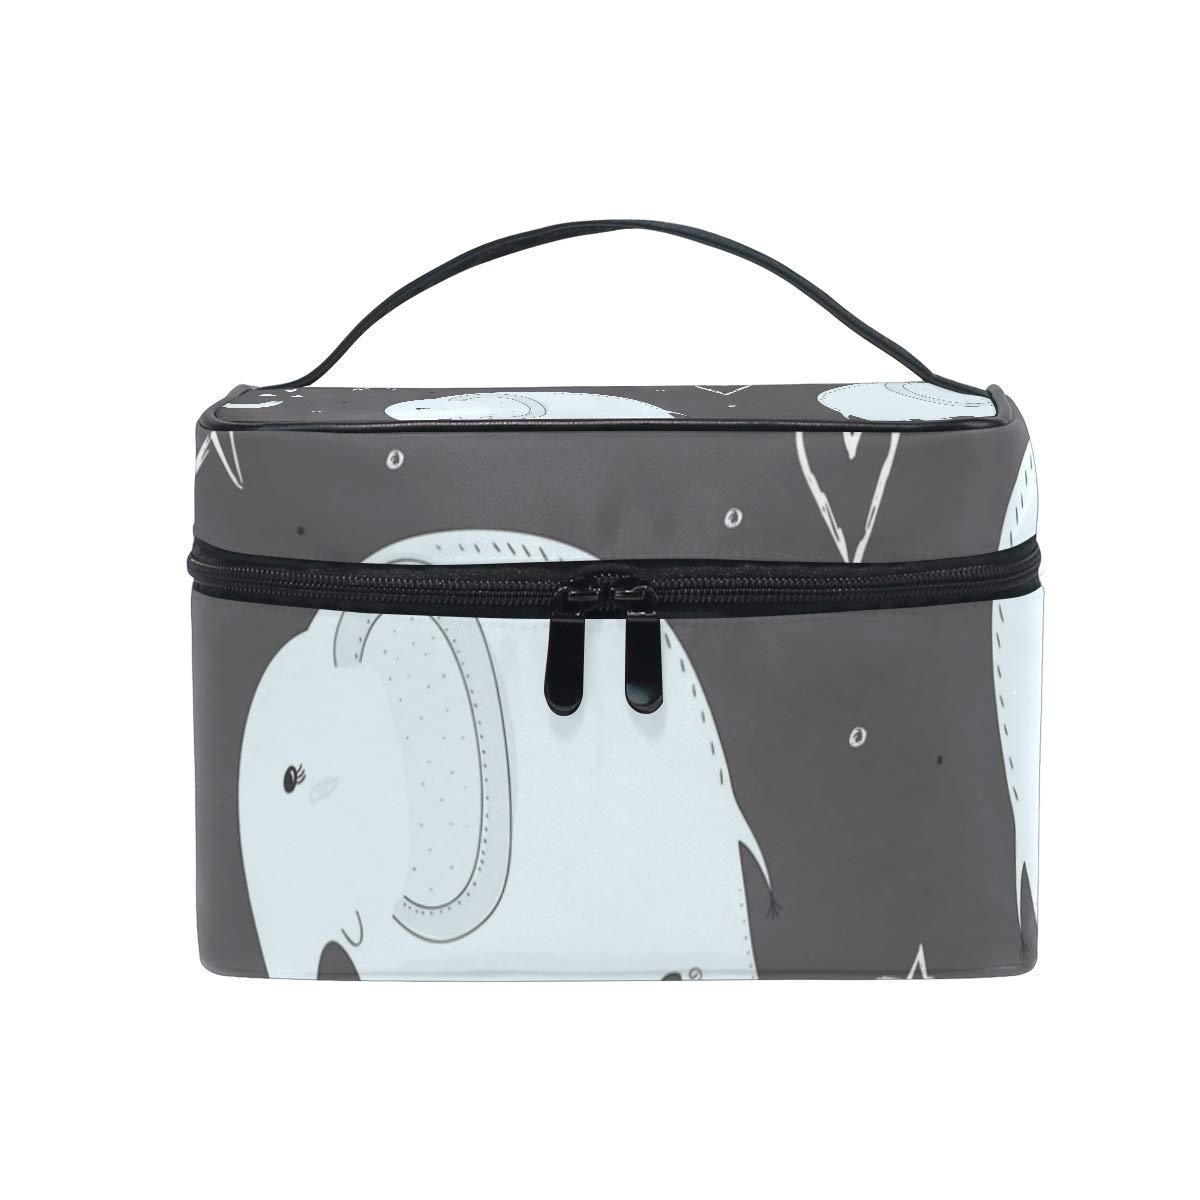 SAVSV Large Cosmetic Makeup Travel Organizer, Elephant Pattern Toiletry Bag Storage Bags Portable Multifunction Case for Women Girls